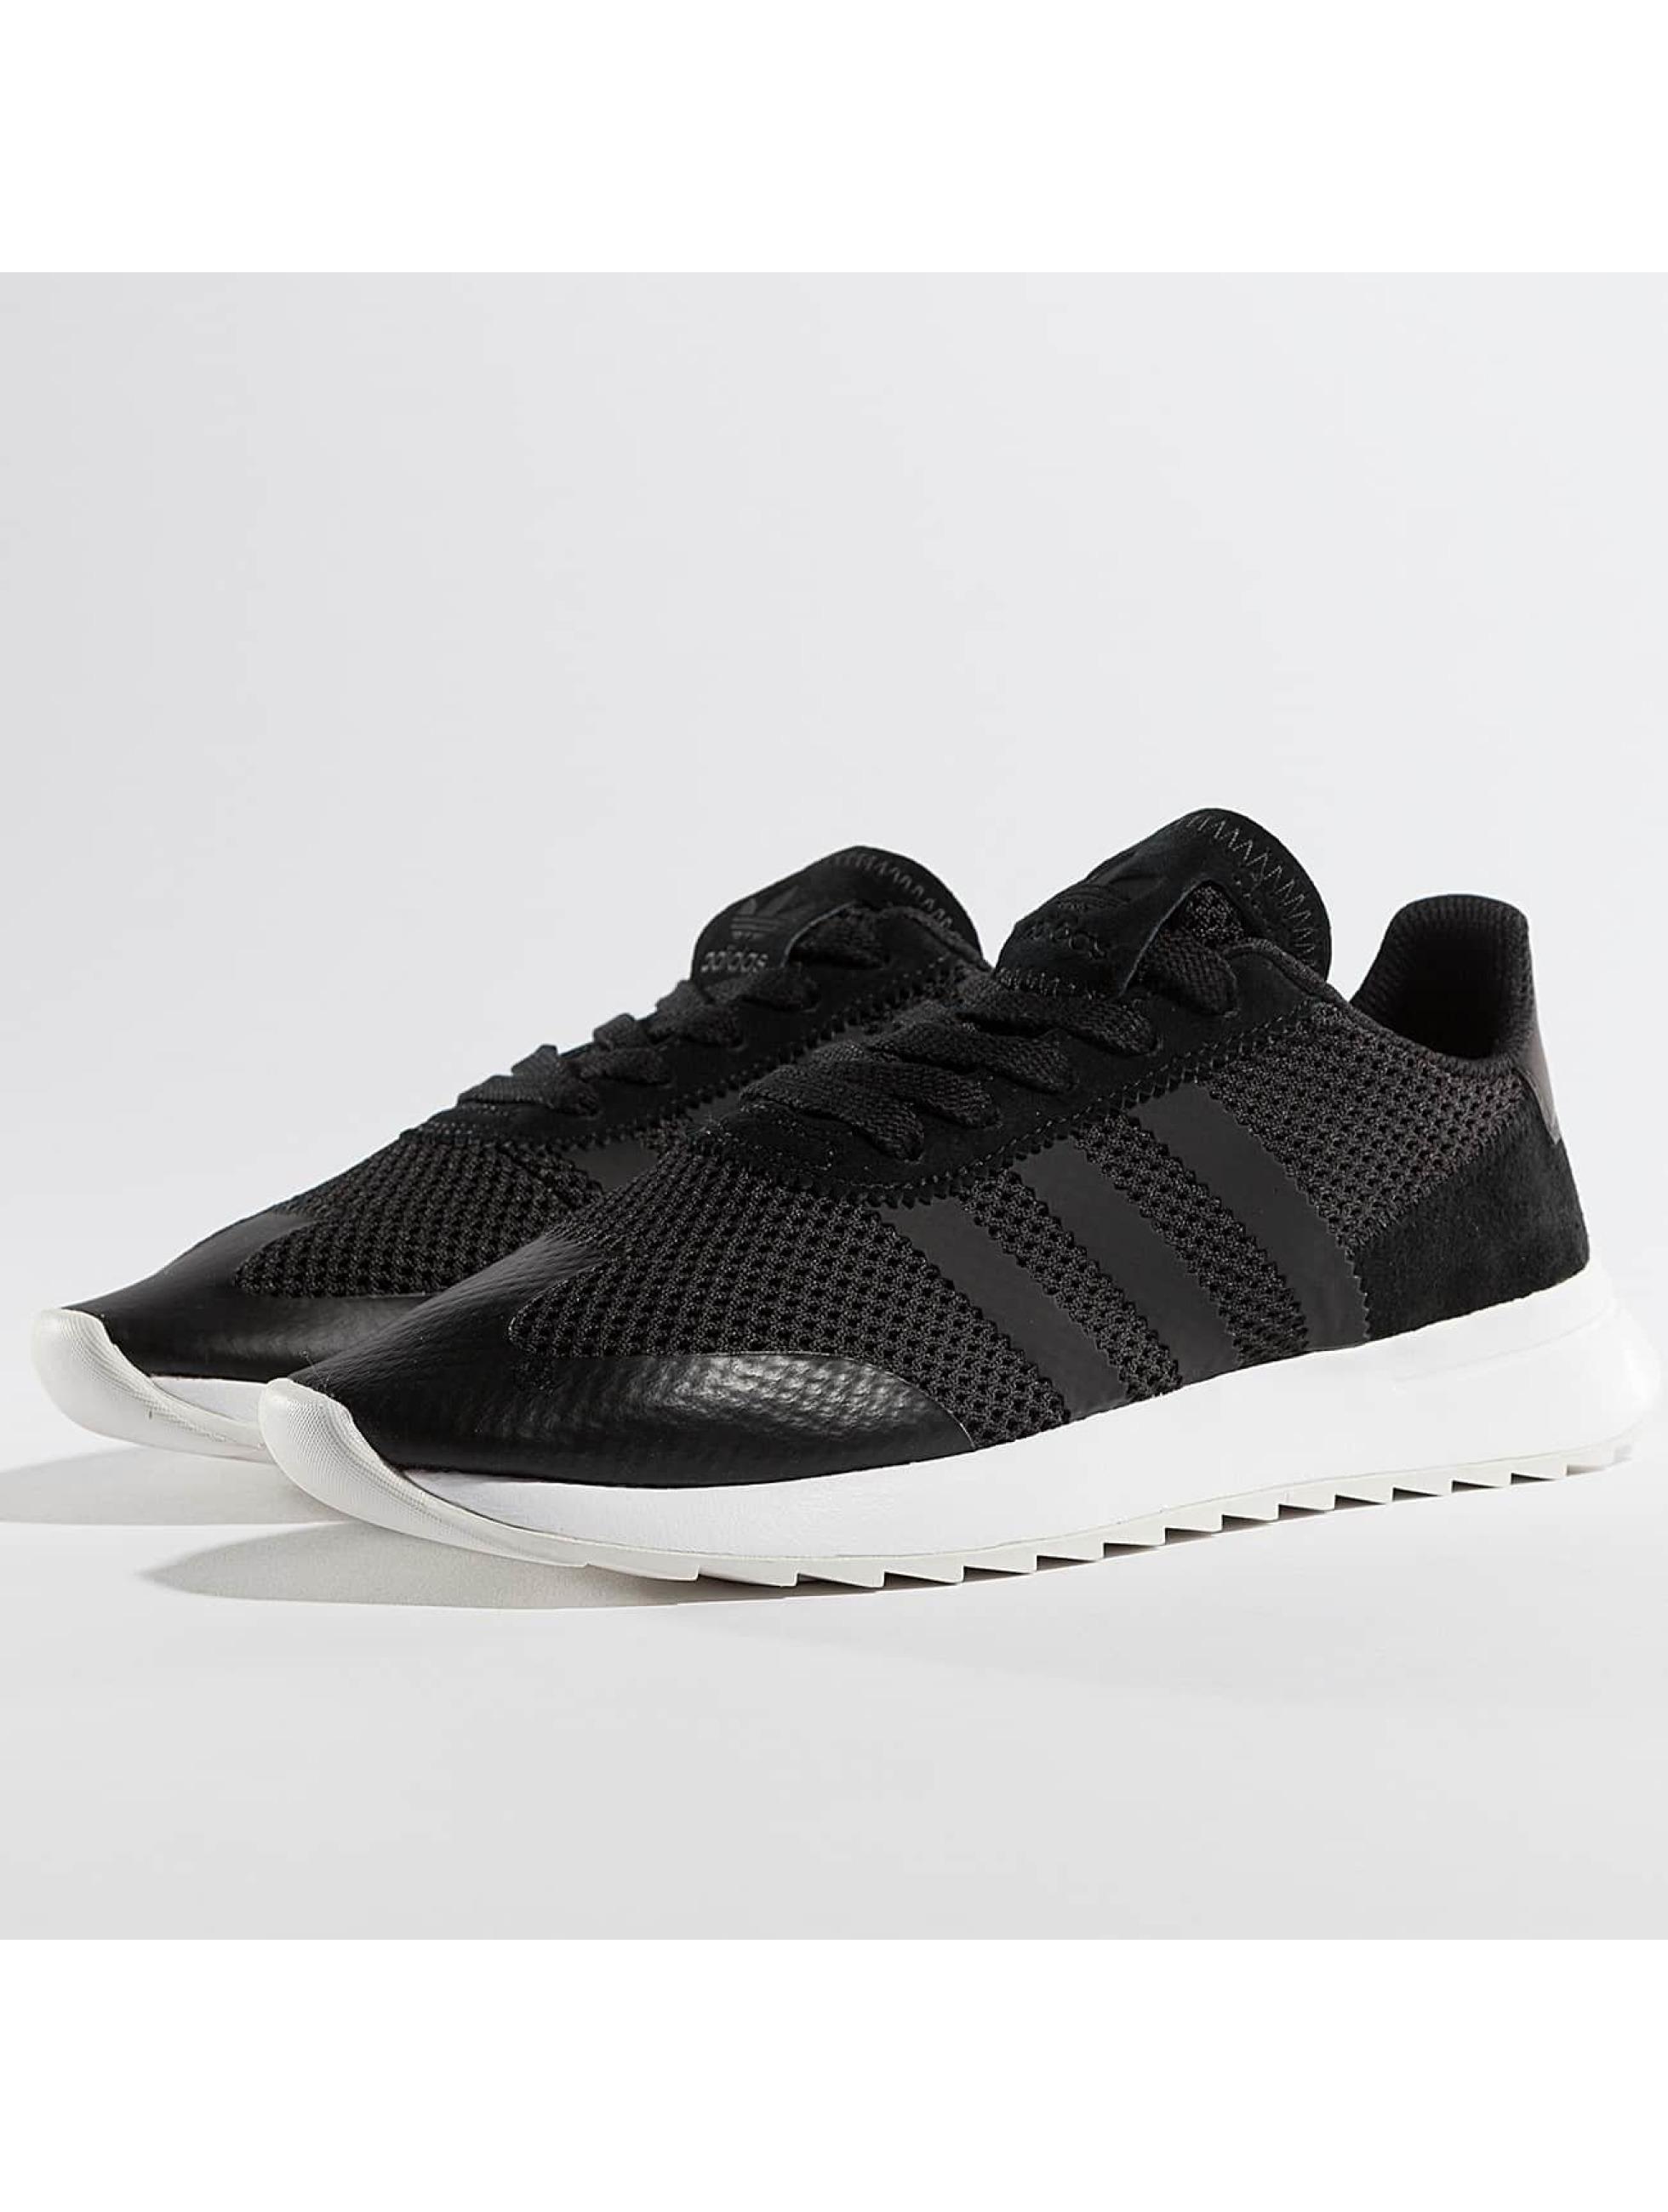 Sneaker Flashback in schwarz